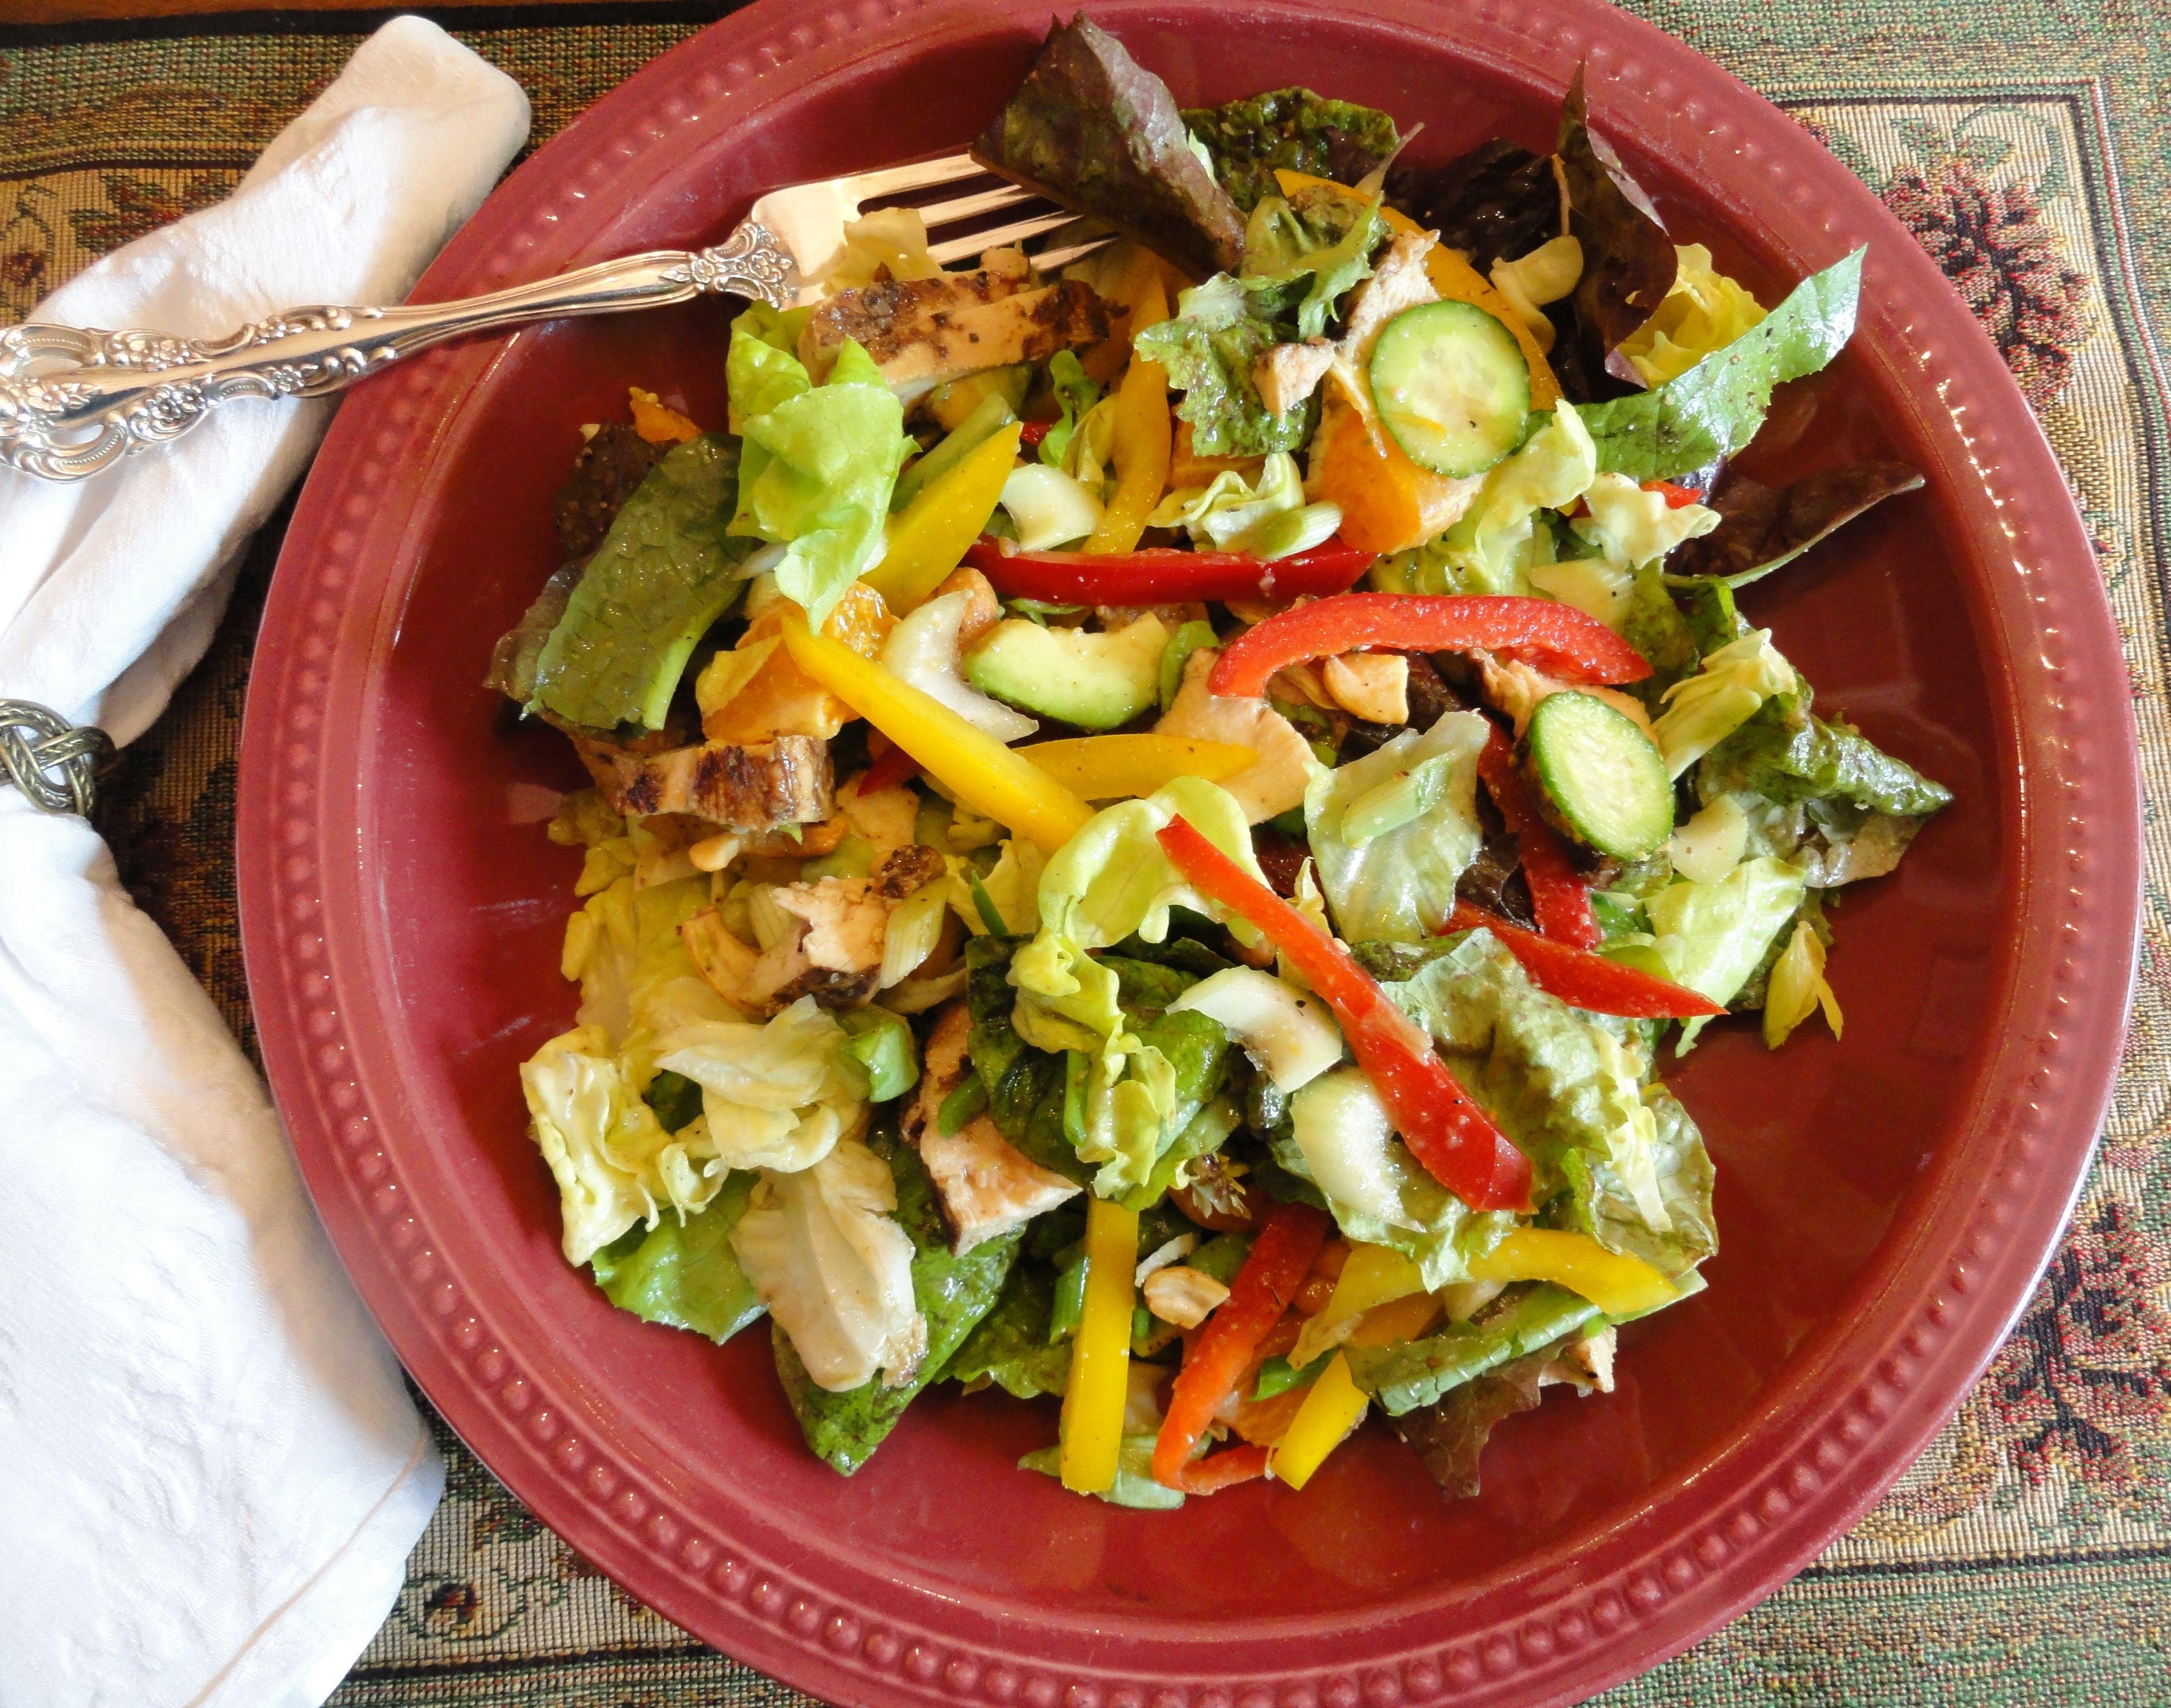 low fat low calorie garlic basil vinaigrette